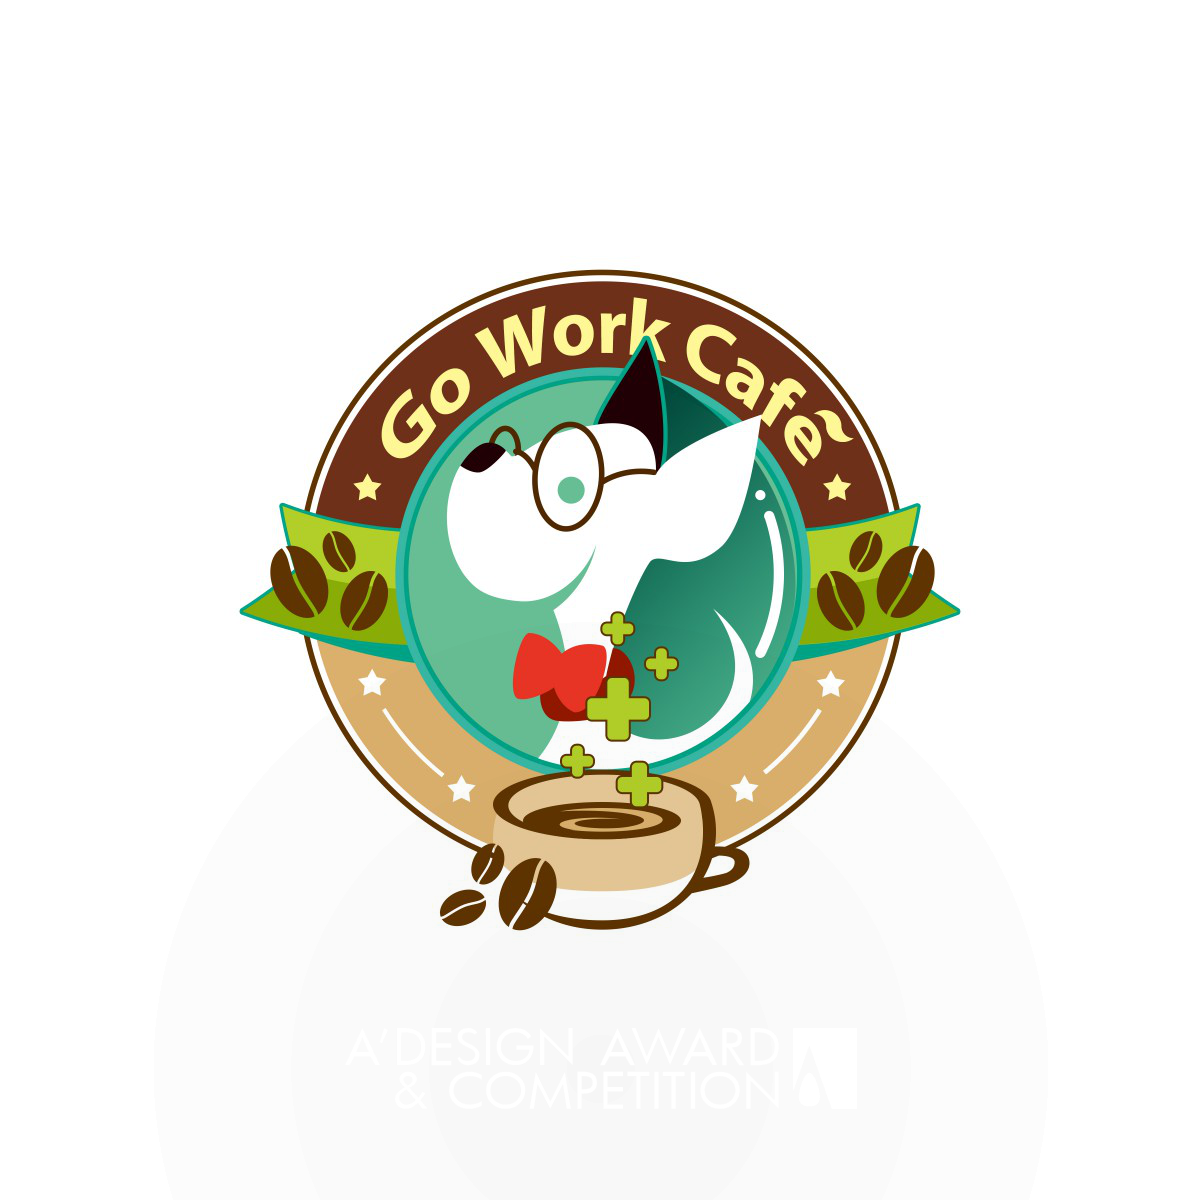 Go Work Corporate Identity